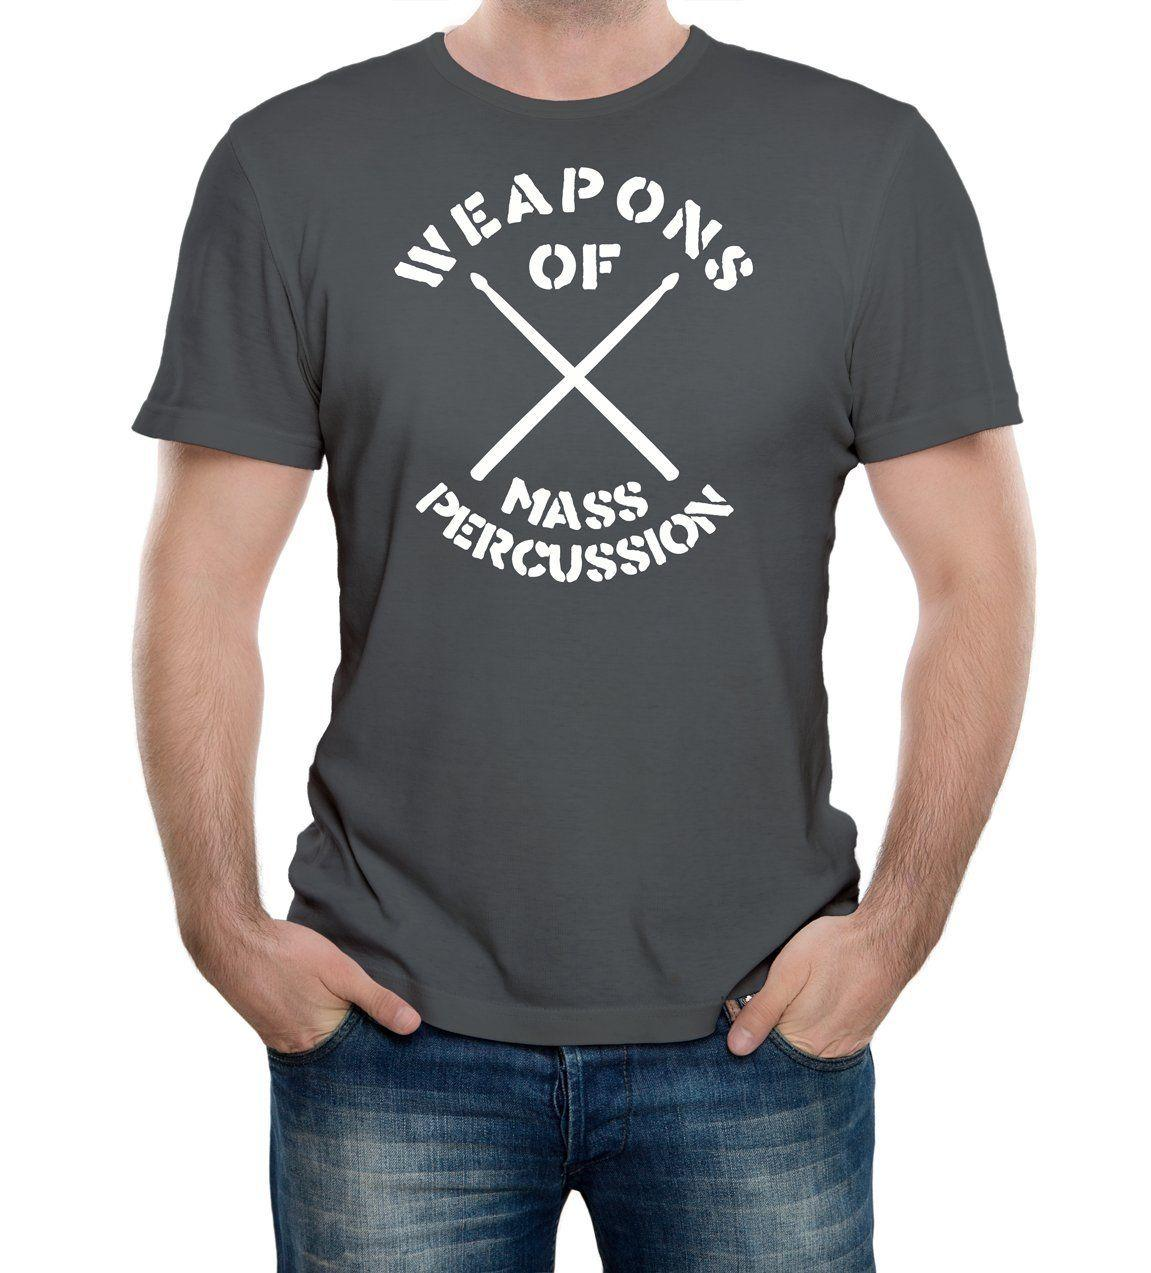 14f3cc1ff Weapons Of Mass Percussion T Shirt Funny T Shirt Retro Drum Drummer Joke  Music Summer Hot Sale, New Tee Print ,Men T Shirt Top, A T Shirts Fun T  Shirts ...